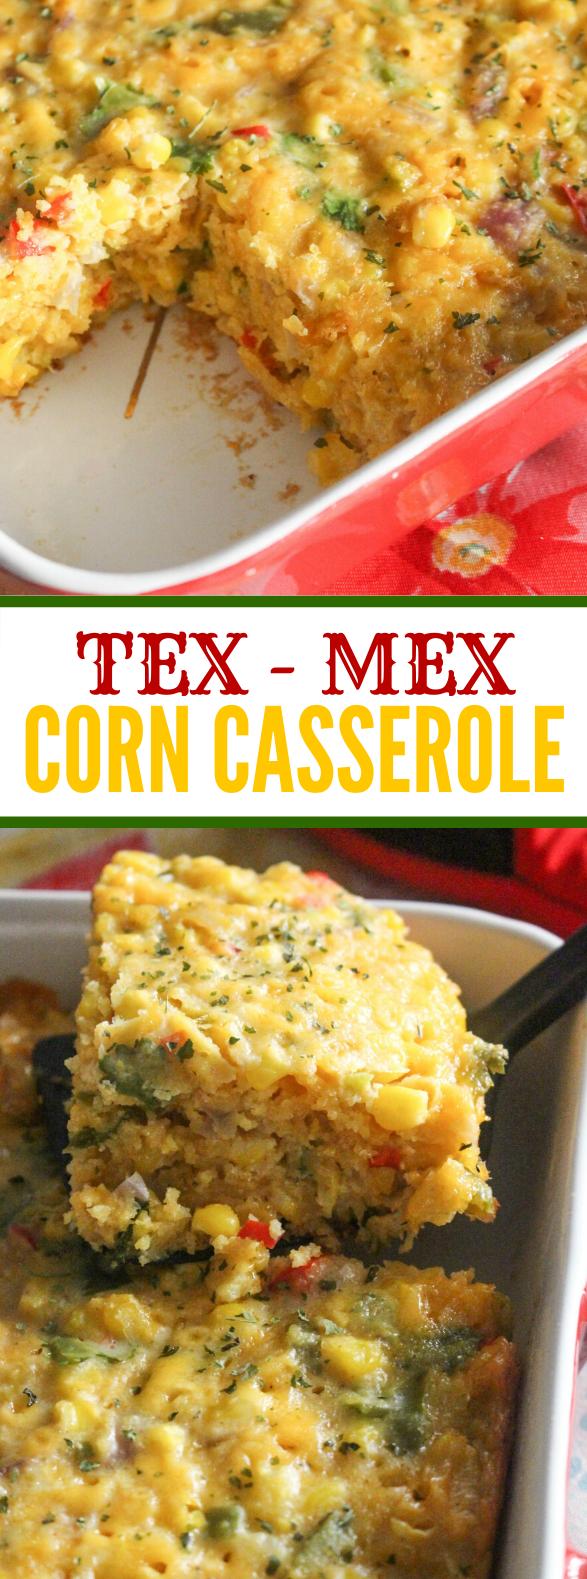 TEX MEX CORN CASSEROLE #dinner #meals